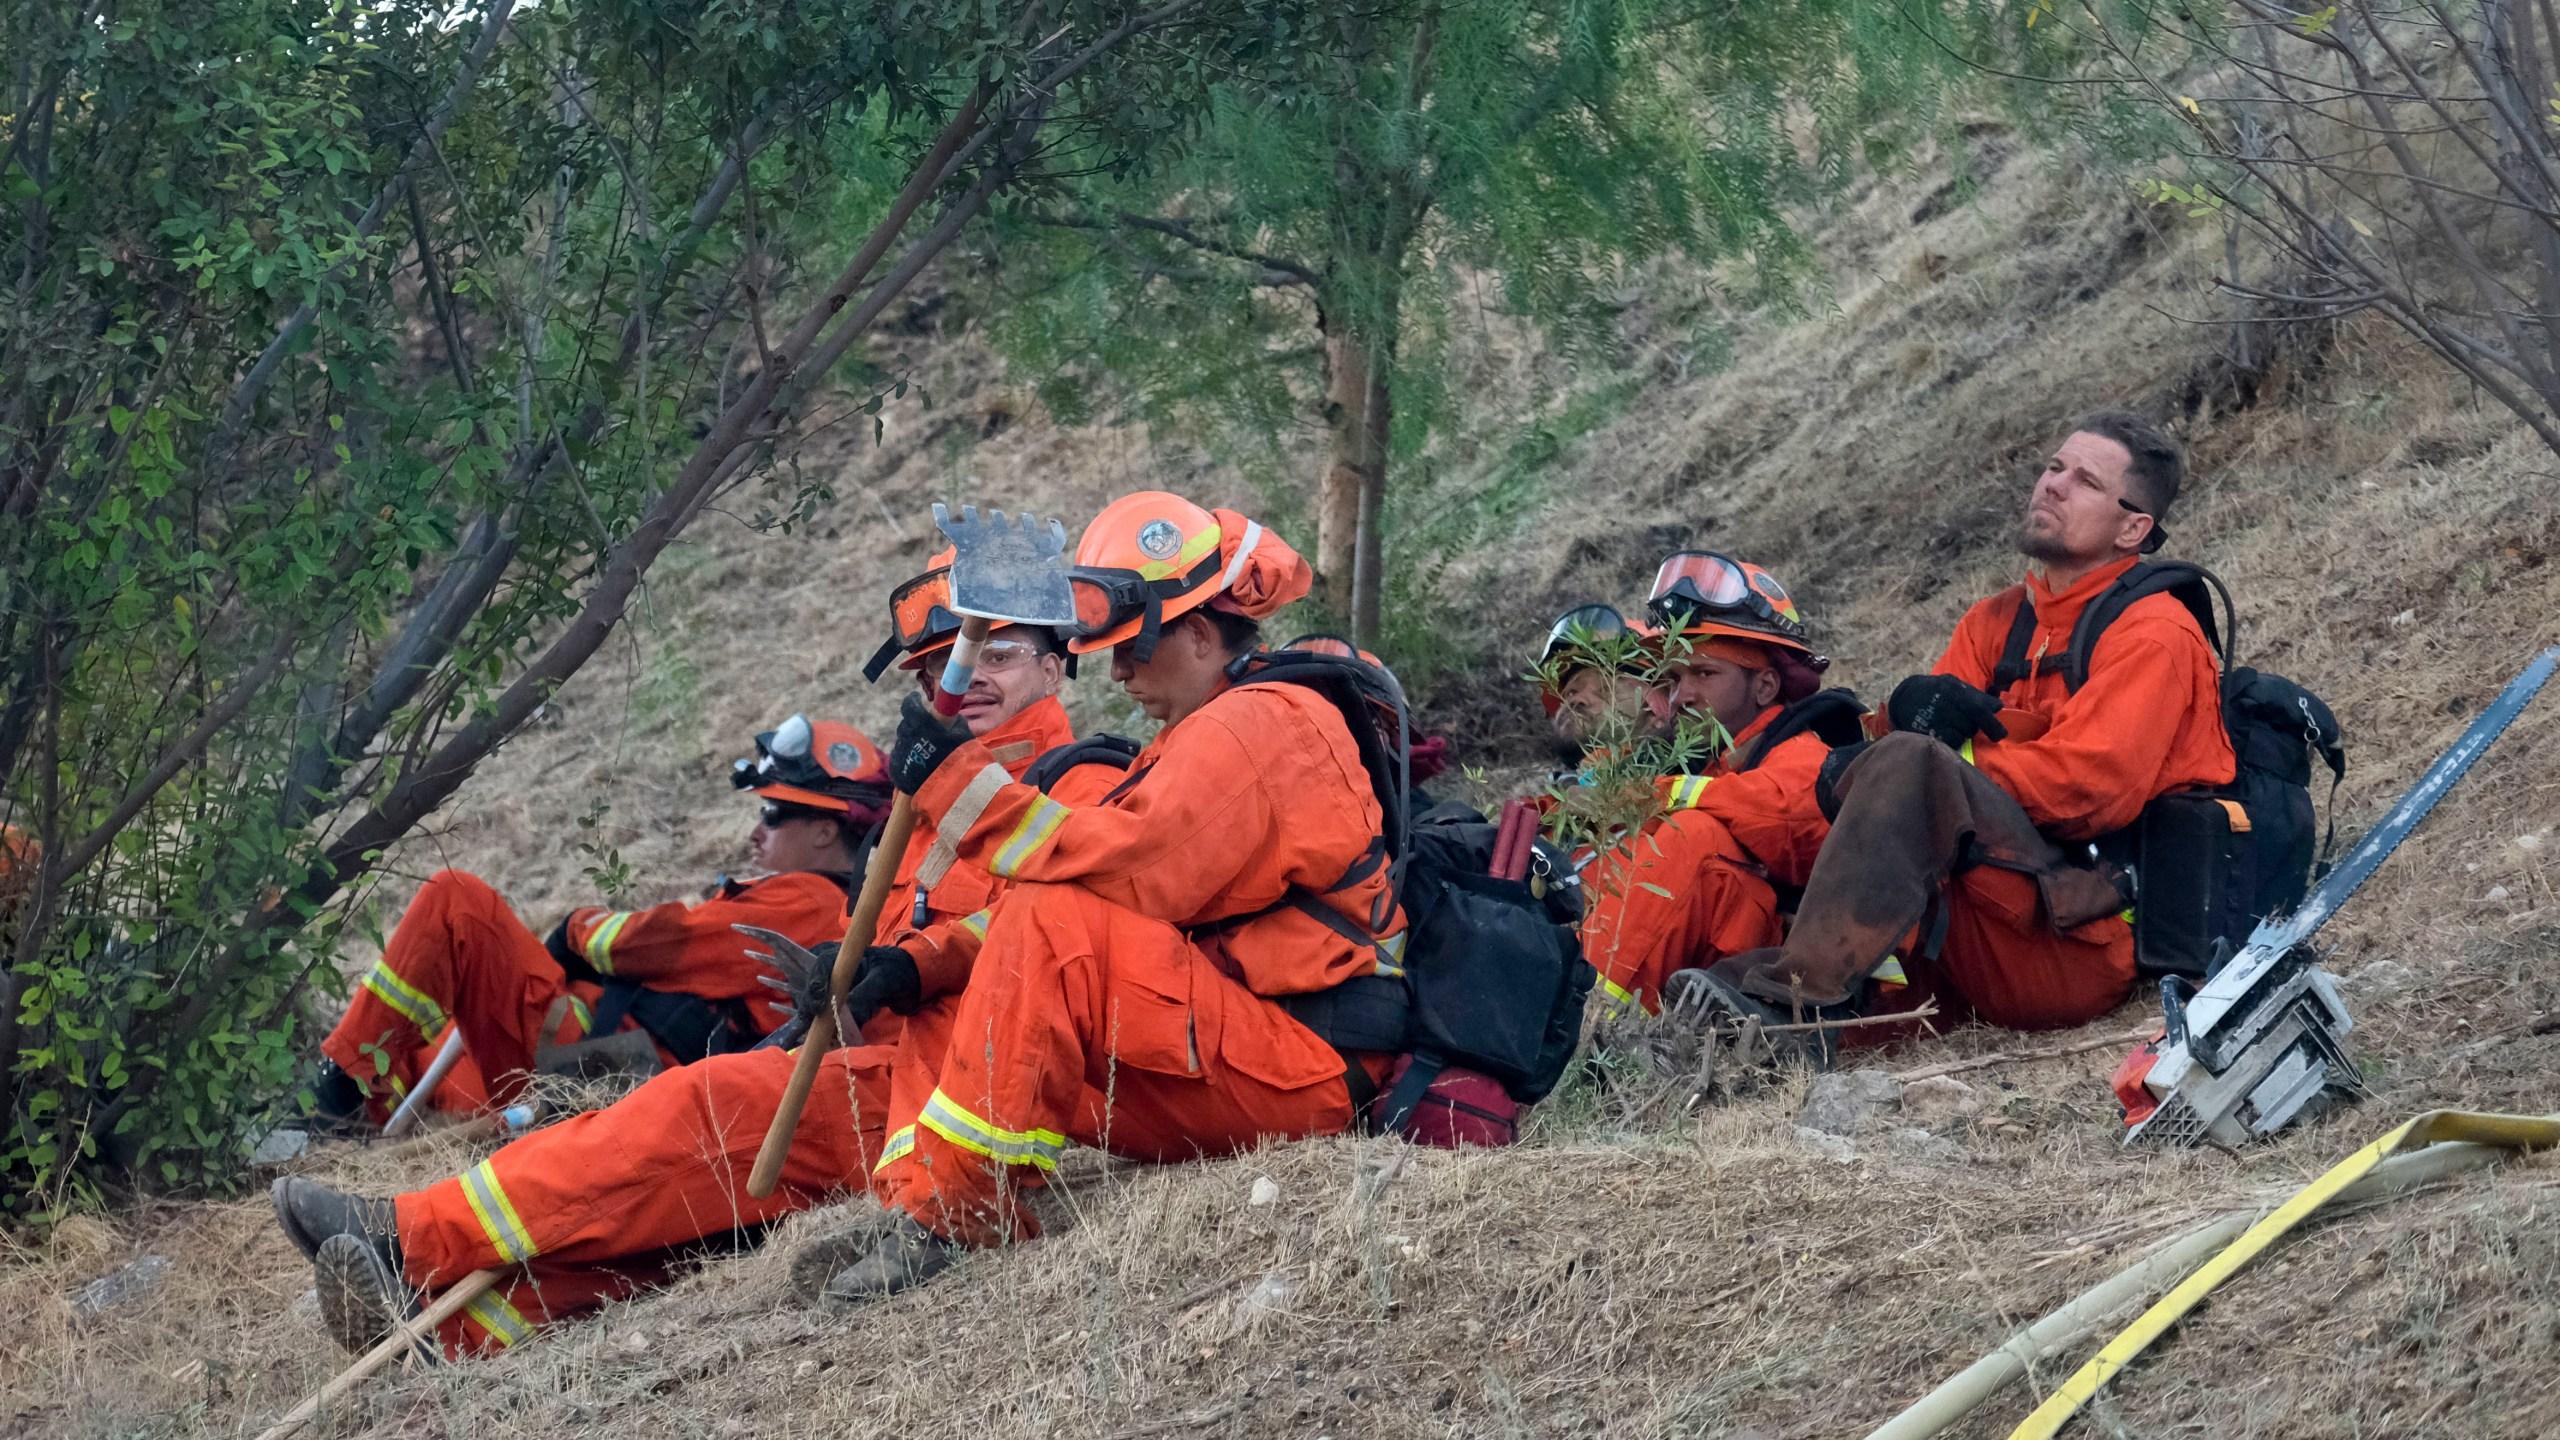 California_Wildfires_27097-159532.jpg67693079